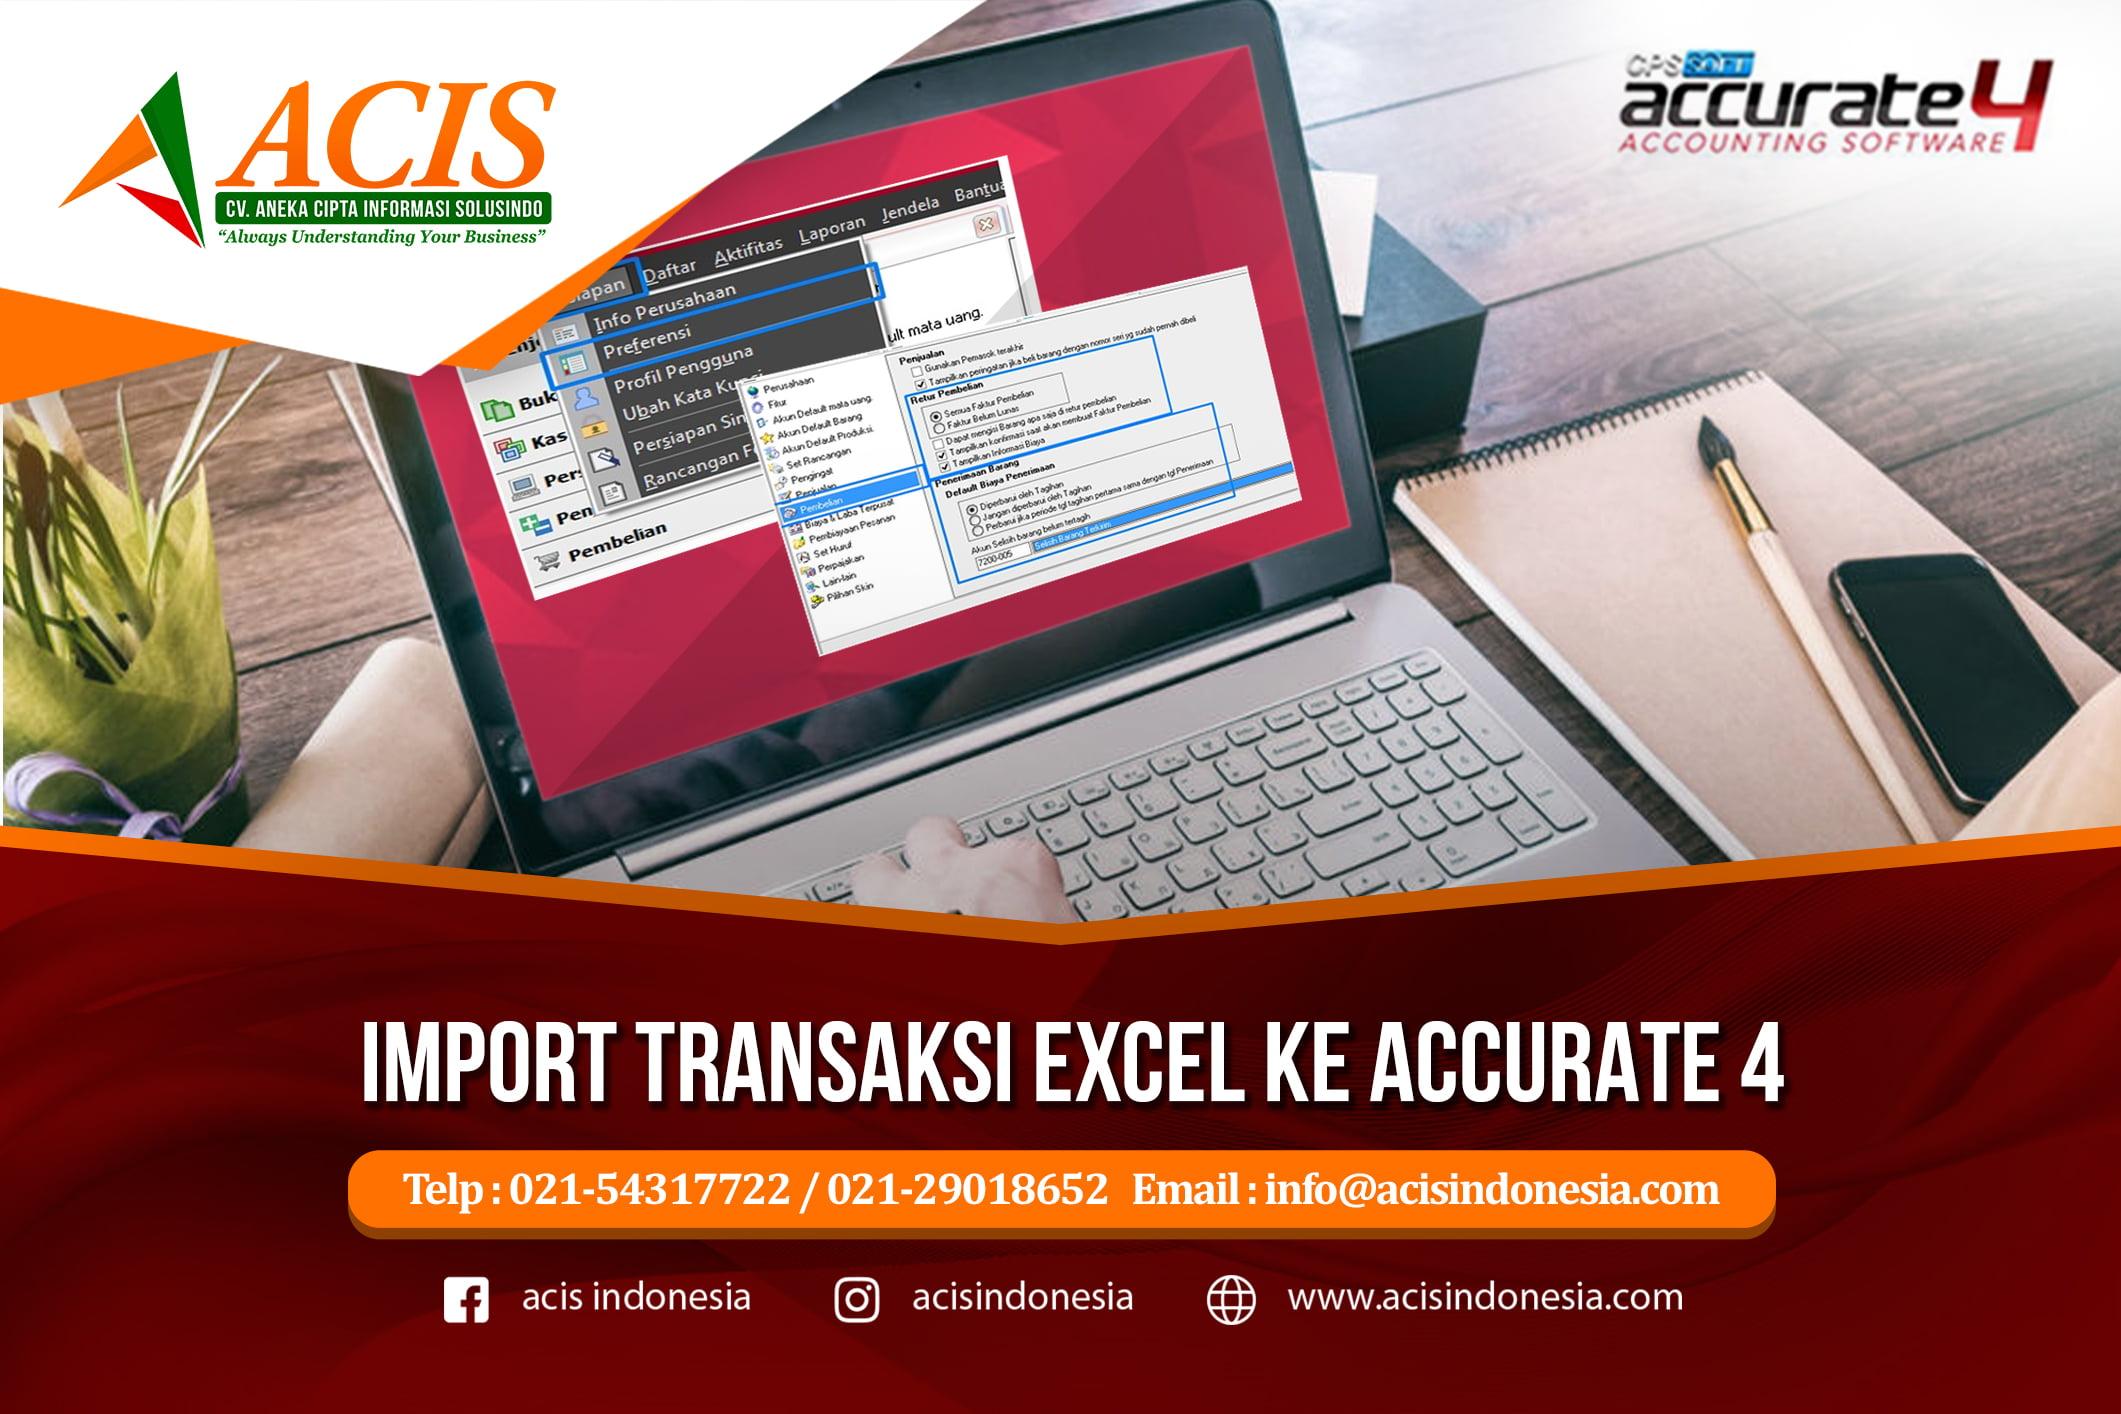 Import transaksi excel ke accurate 4